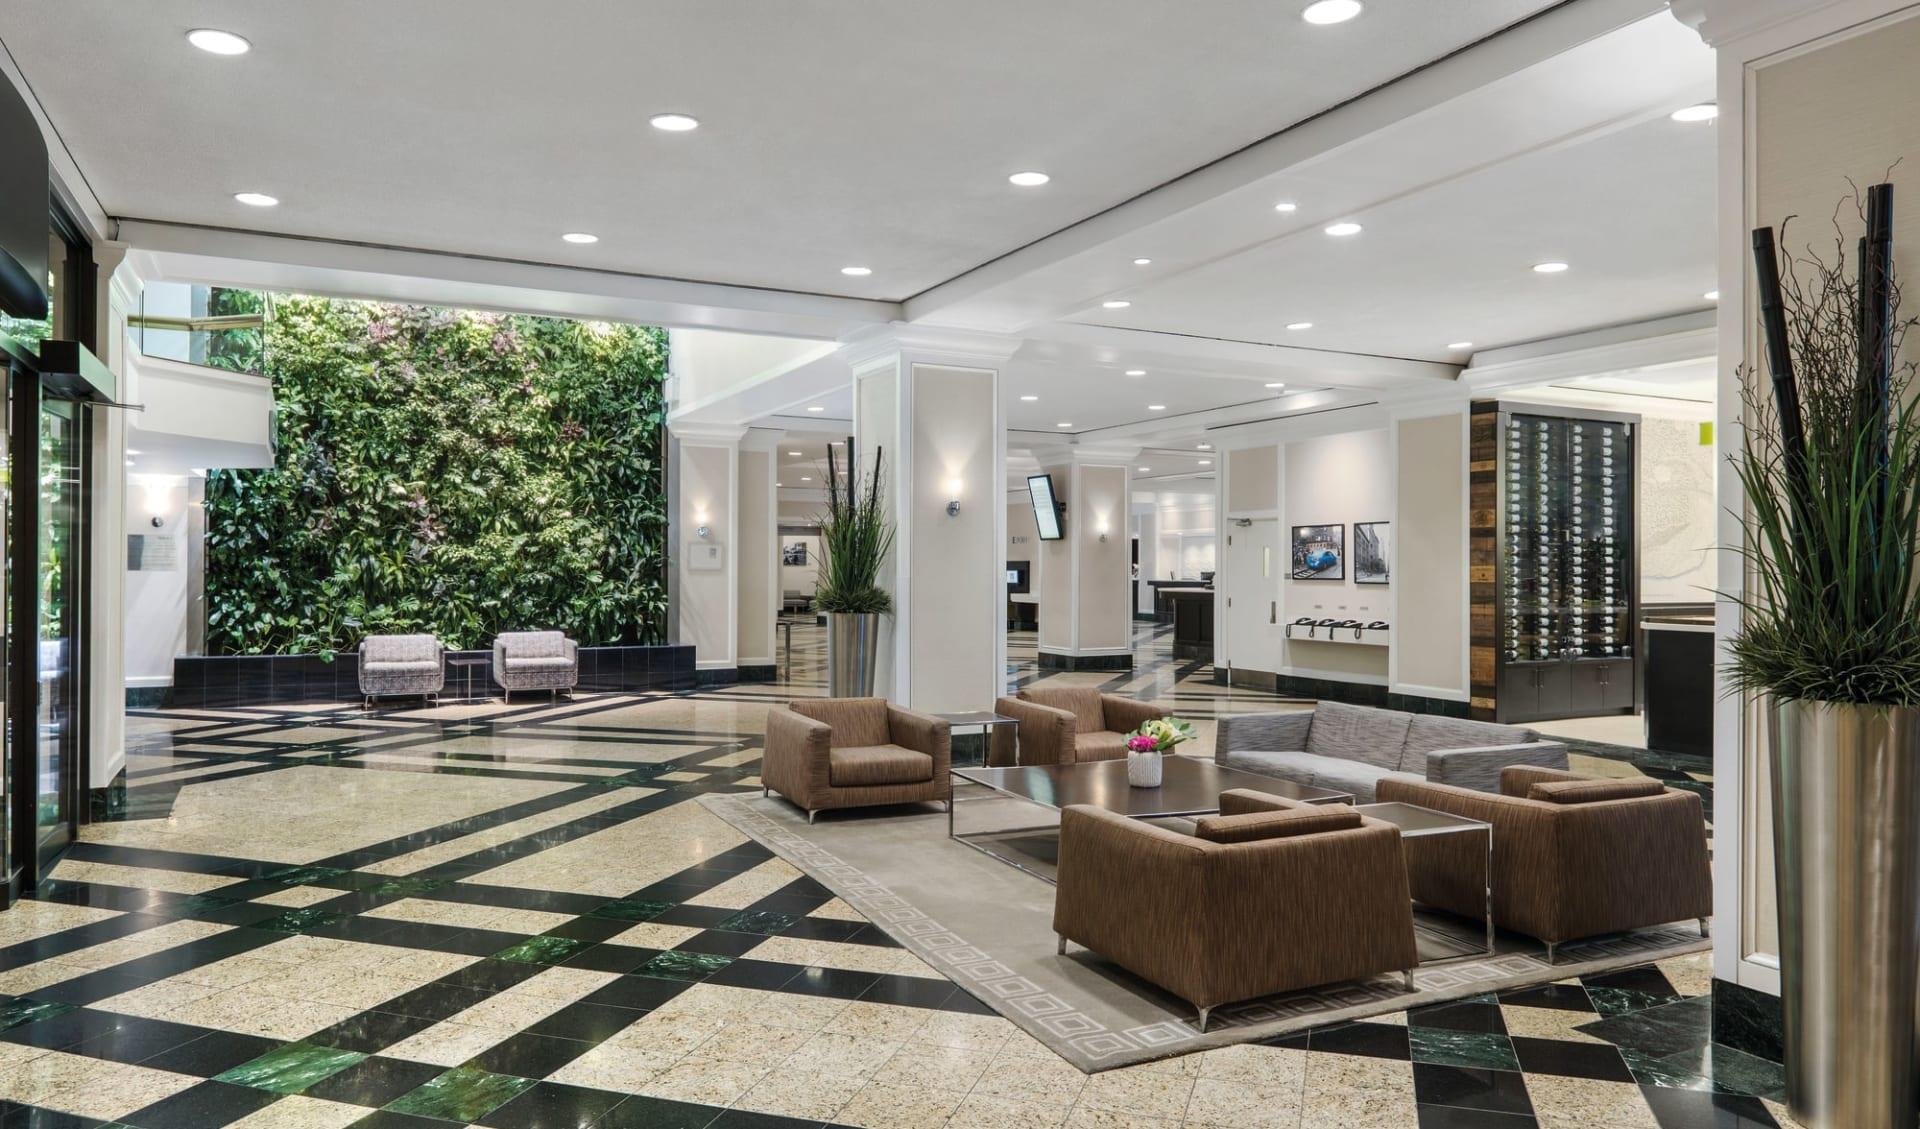 Chelsea Hotel in Toronto:  Chelsea Hotel_BayStreetLobby